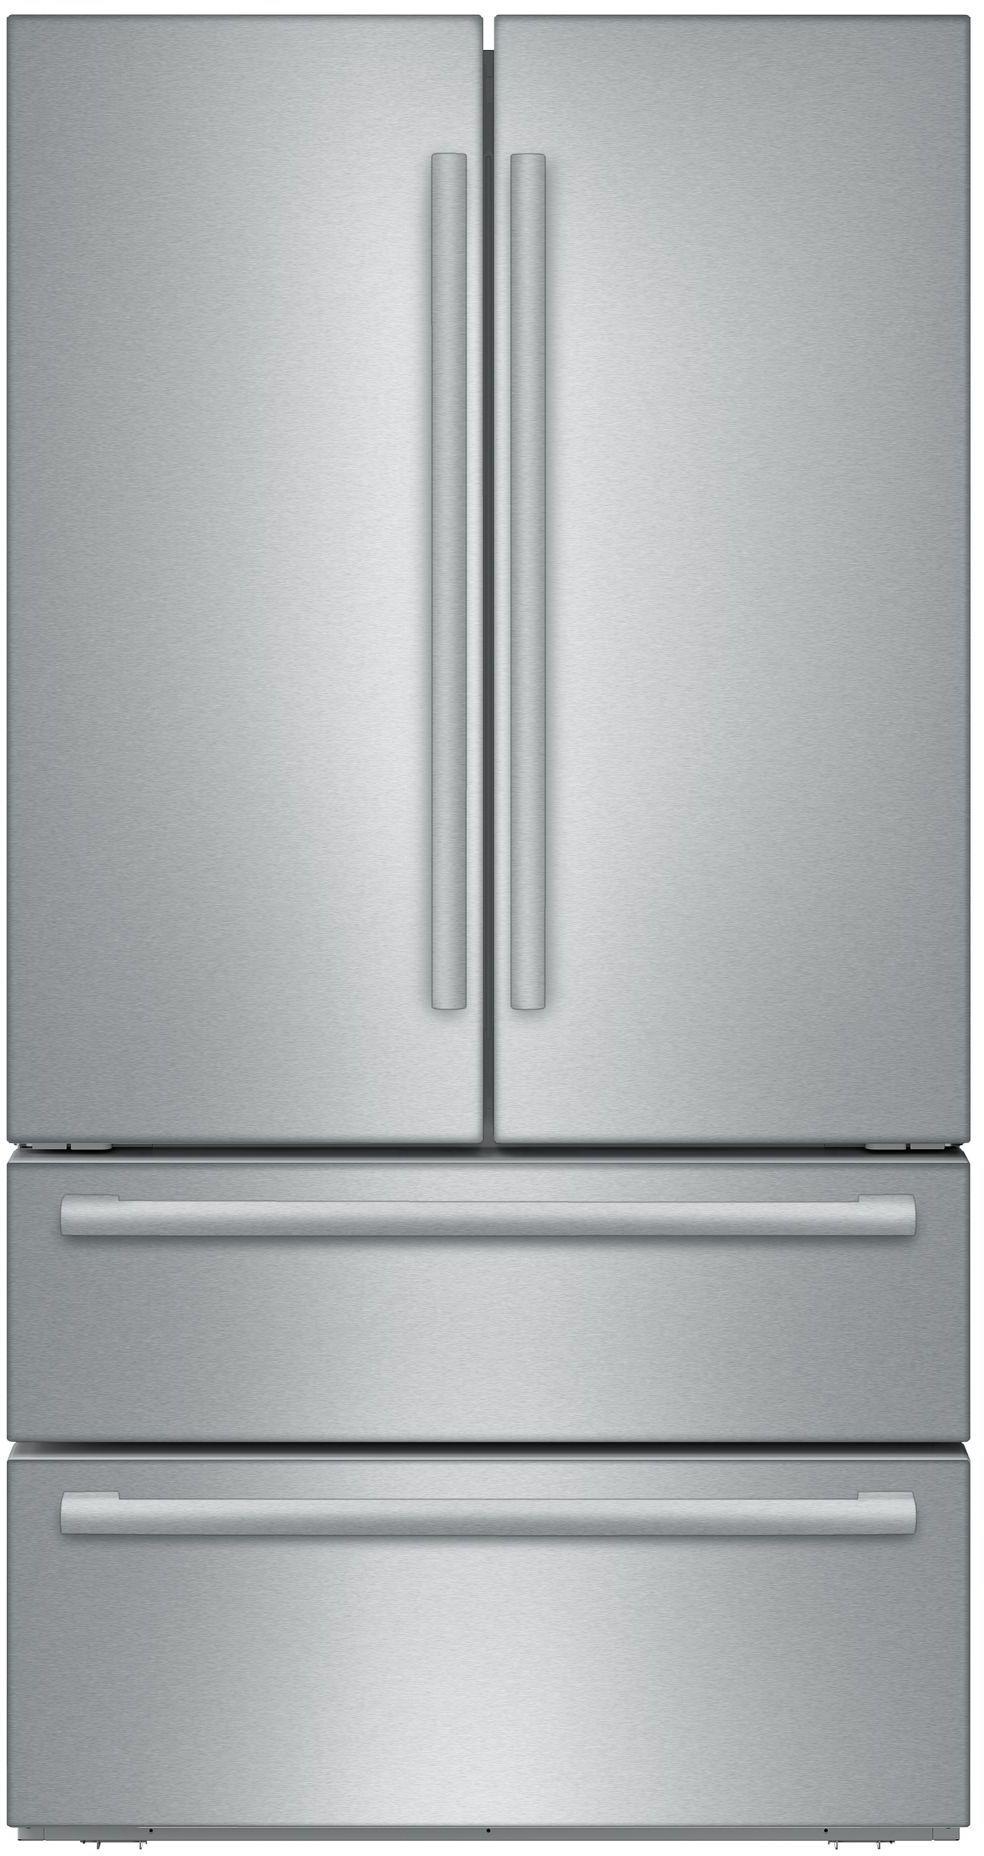 Counter depth refrigerator bosch 800 series 36 counter depth french door refrigerator stainless steel b21cl81sns rubansaba